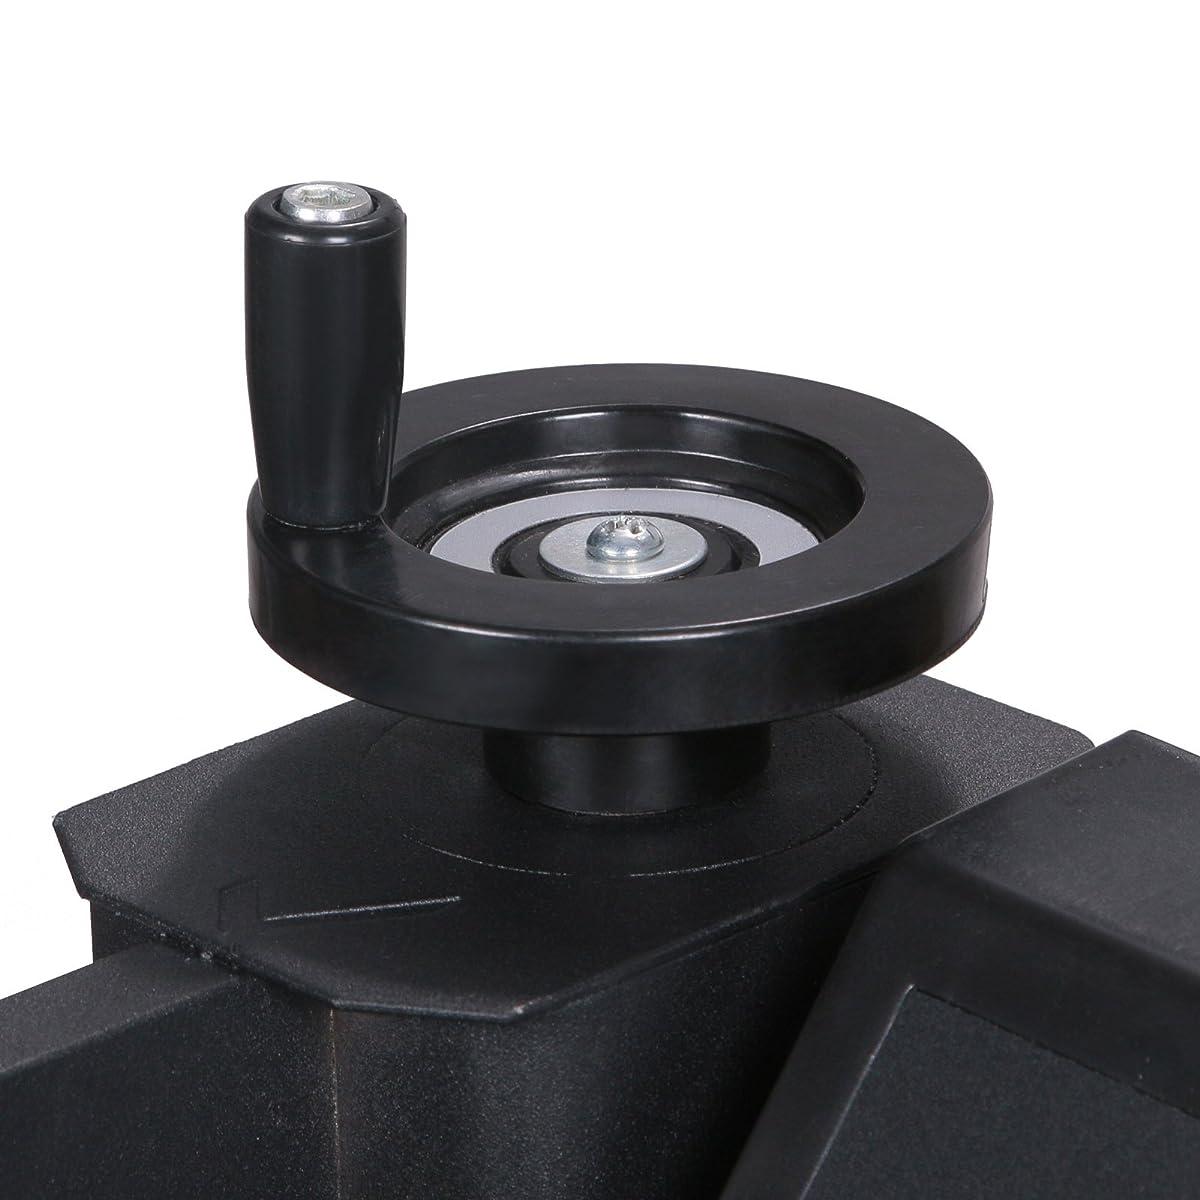 Mophorn Heat Press 8 in 1 Multifunction Sublimation Heat Press Machine Desktop Iron Baseball Hat Press 1400W Digital Swing Away Transfer T Shirt Hat Mug (8IN1)